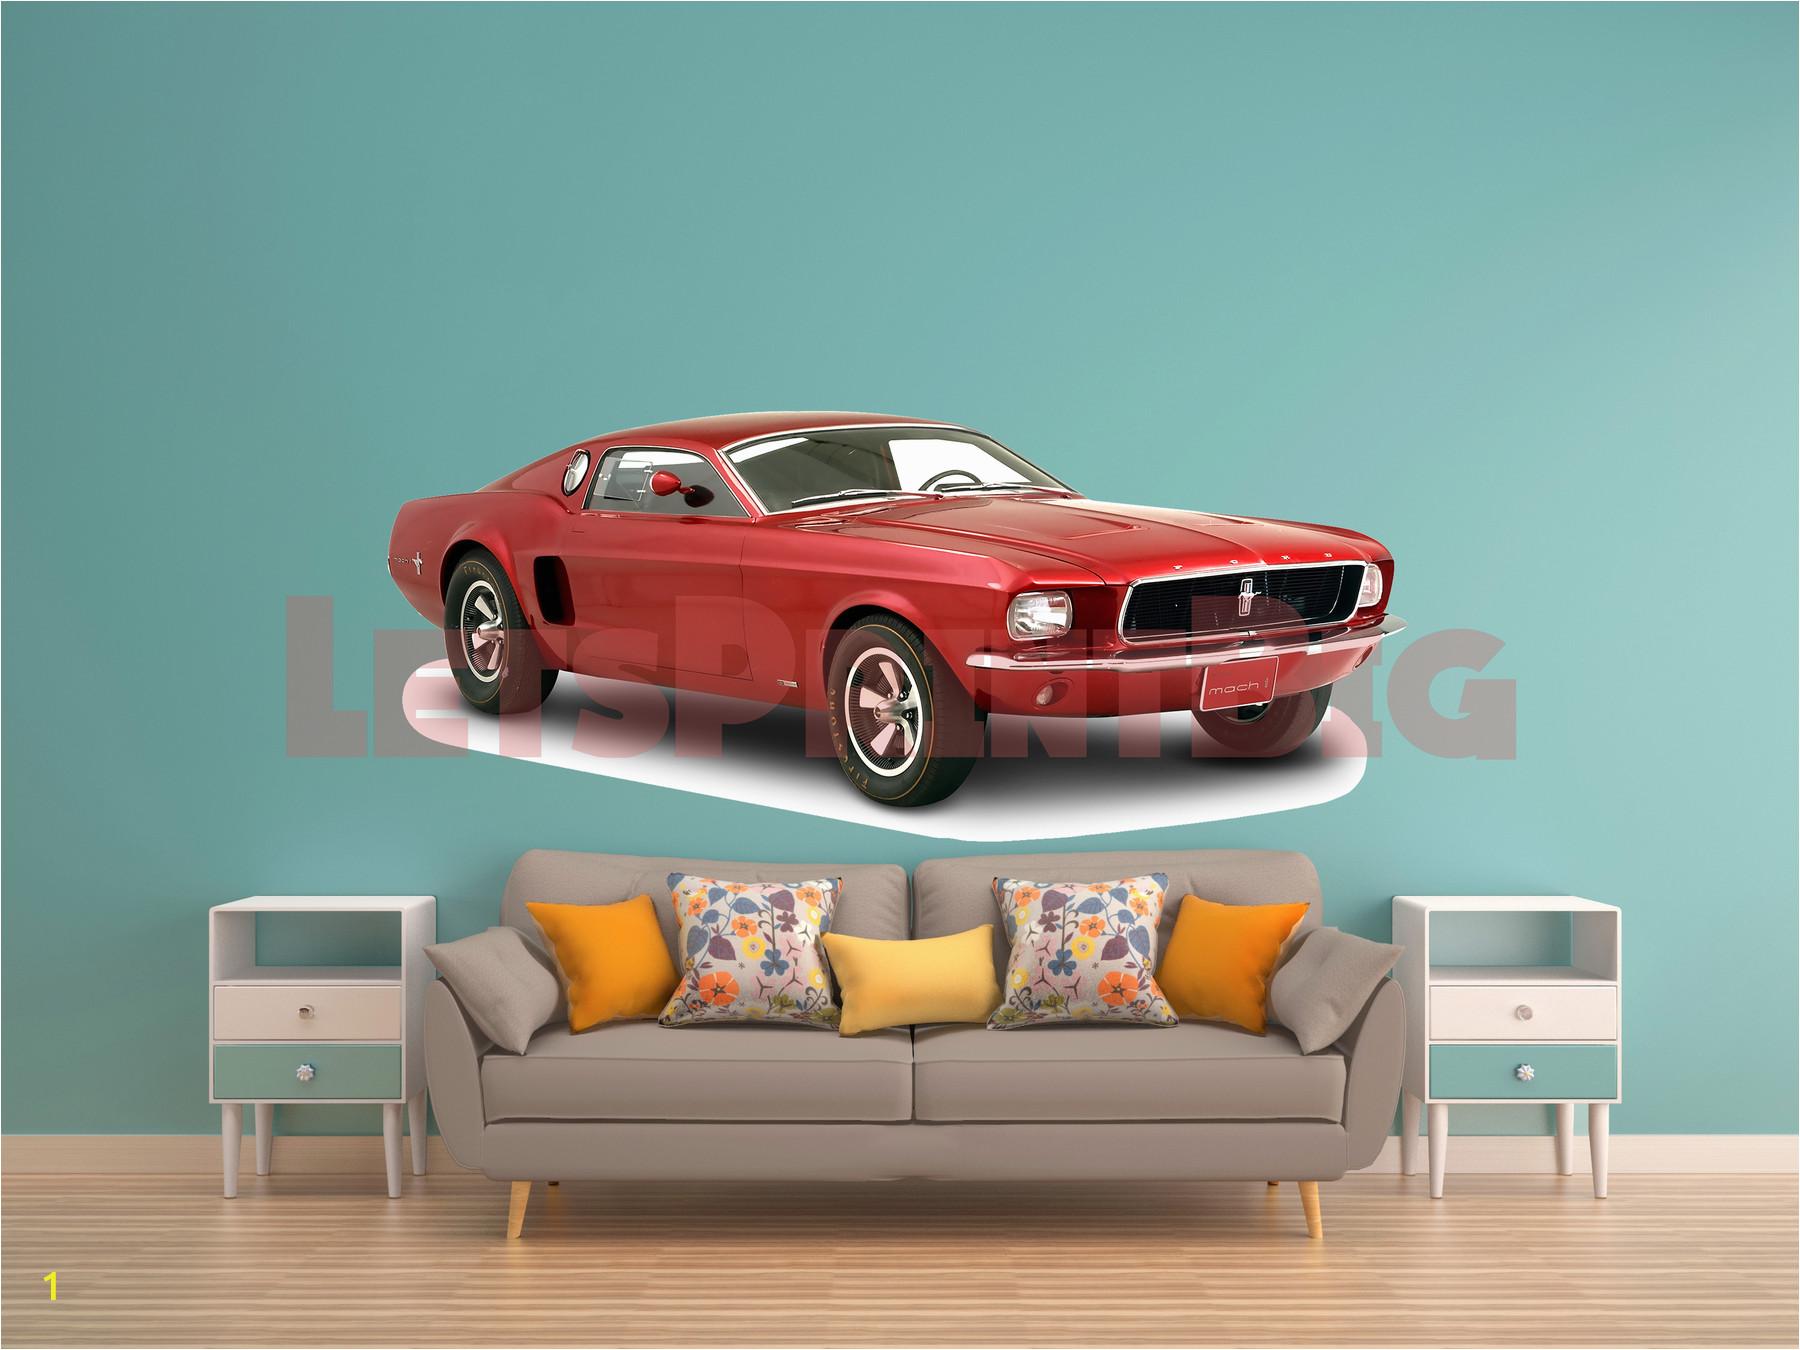 Ford Mustang 1 06d8d01b 69ee 4a2e 8bef f1ab7c e 1800x1800